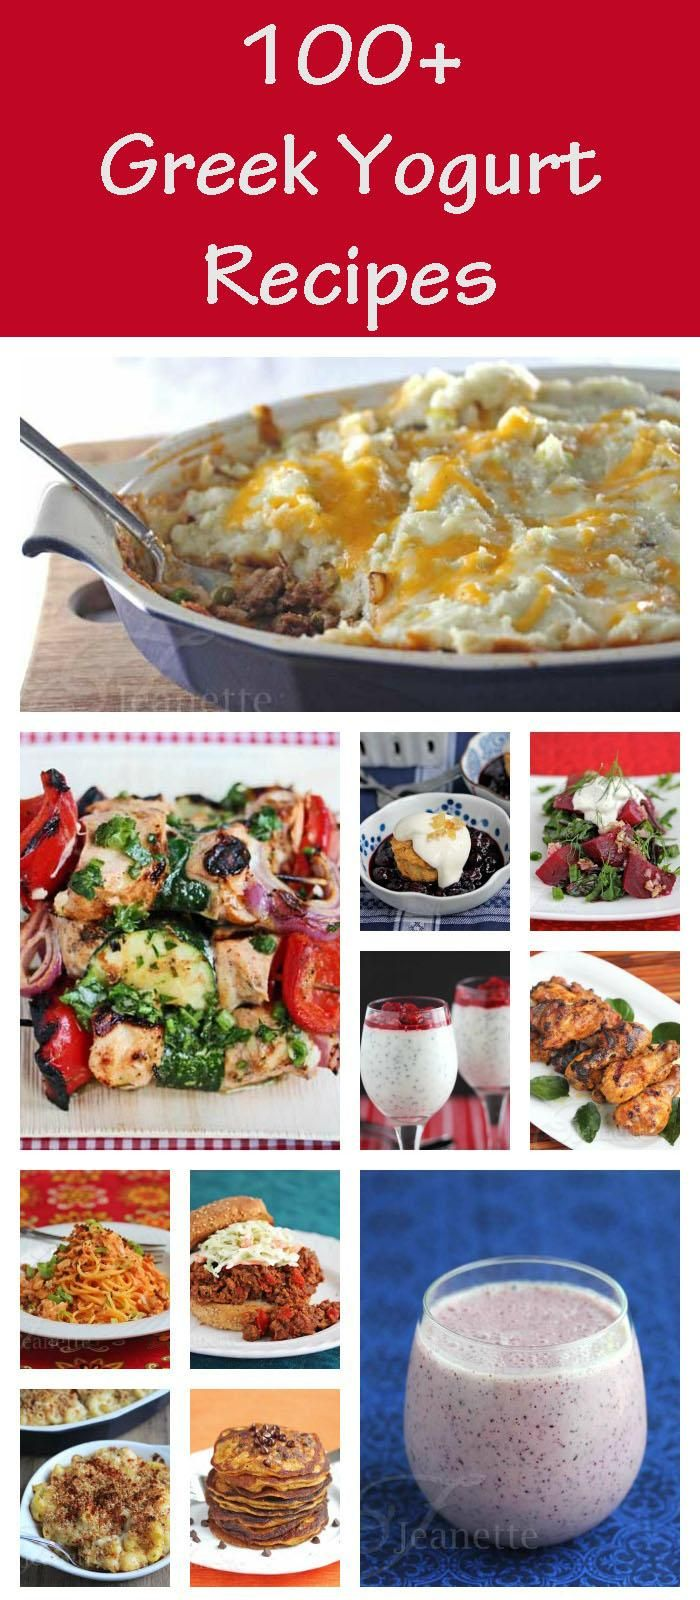 100 Greek Yogurt Recipes -- How To Use Greek Yogurt! via @Jeanette Lai Thomas | Jeanette's Healthy Living